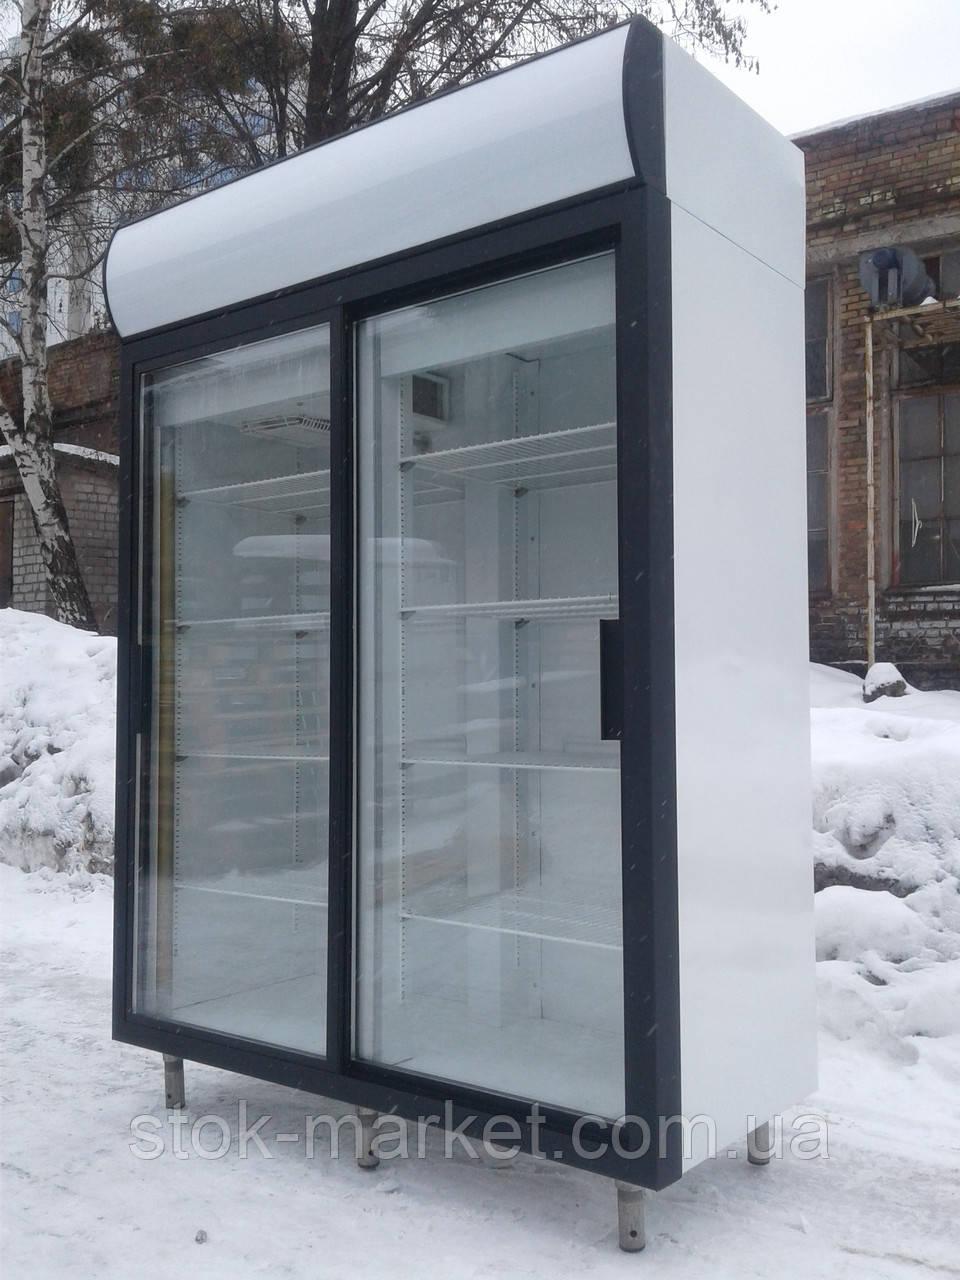 Холодильный шкаф Polair dm 110 sd-s б/у, холодильный шкаф купе б у, шкаф витрина б/у